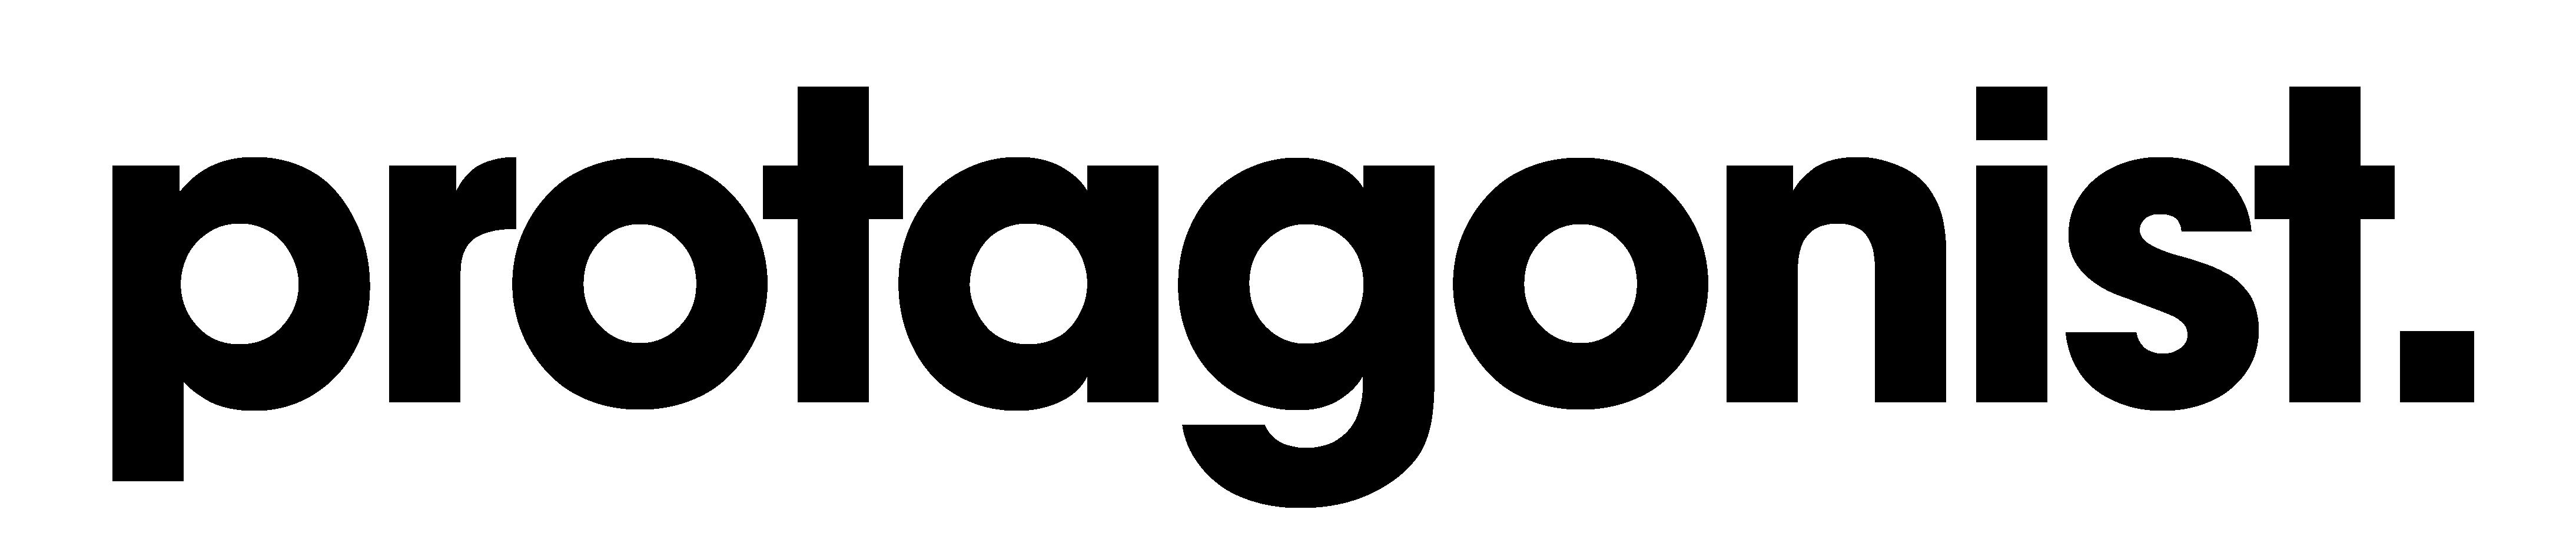 PROTAGONIST digitalna agencija